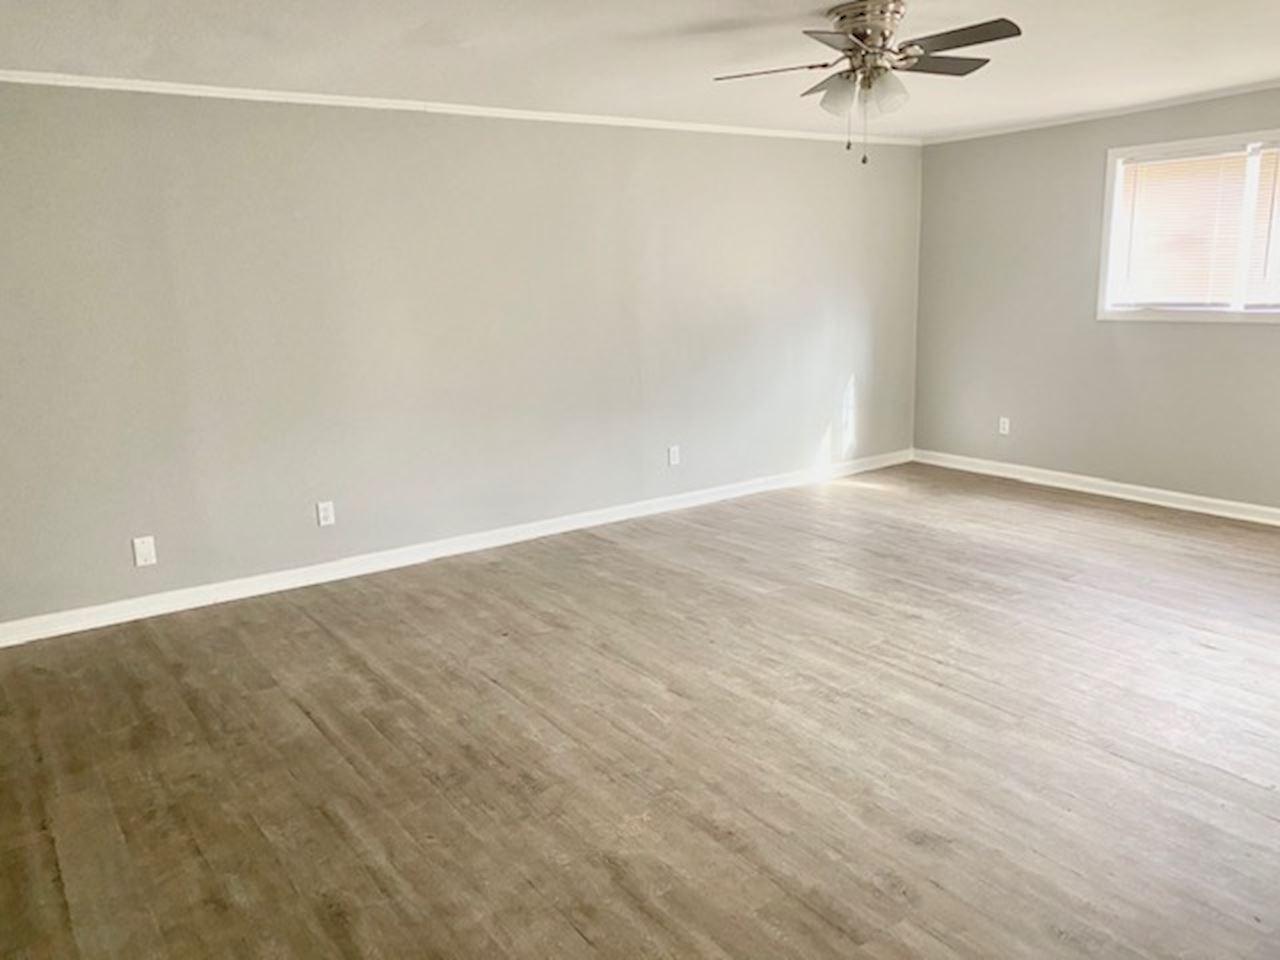 investment property - 2714 Nix Cv, Memphis, TN 38127, Shelby - image 4